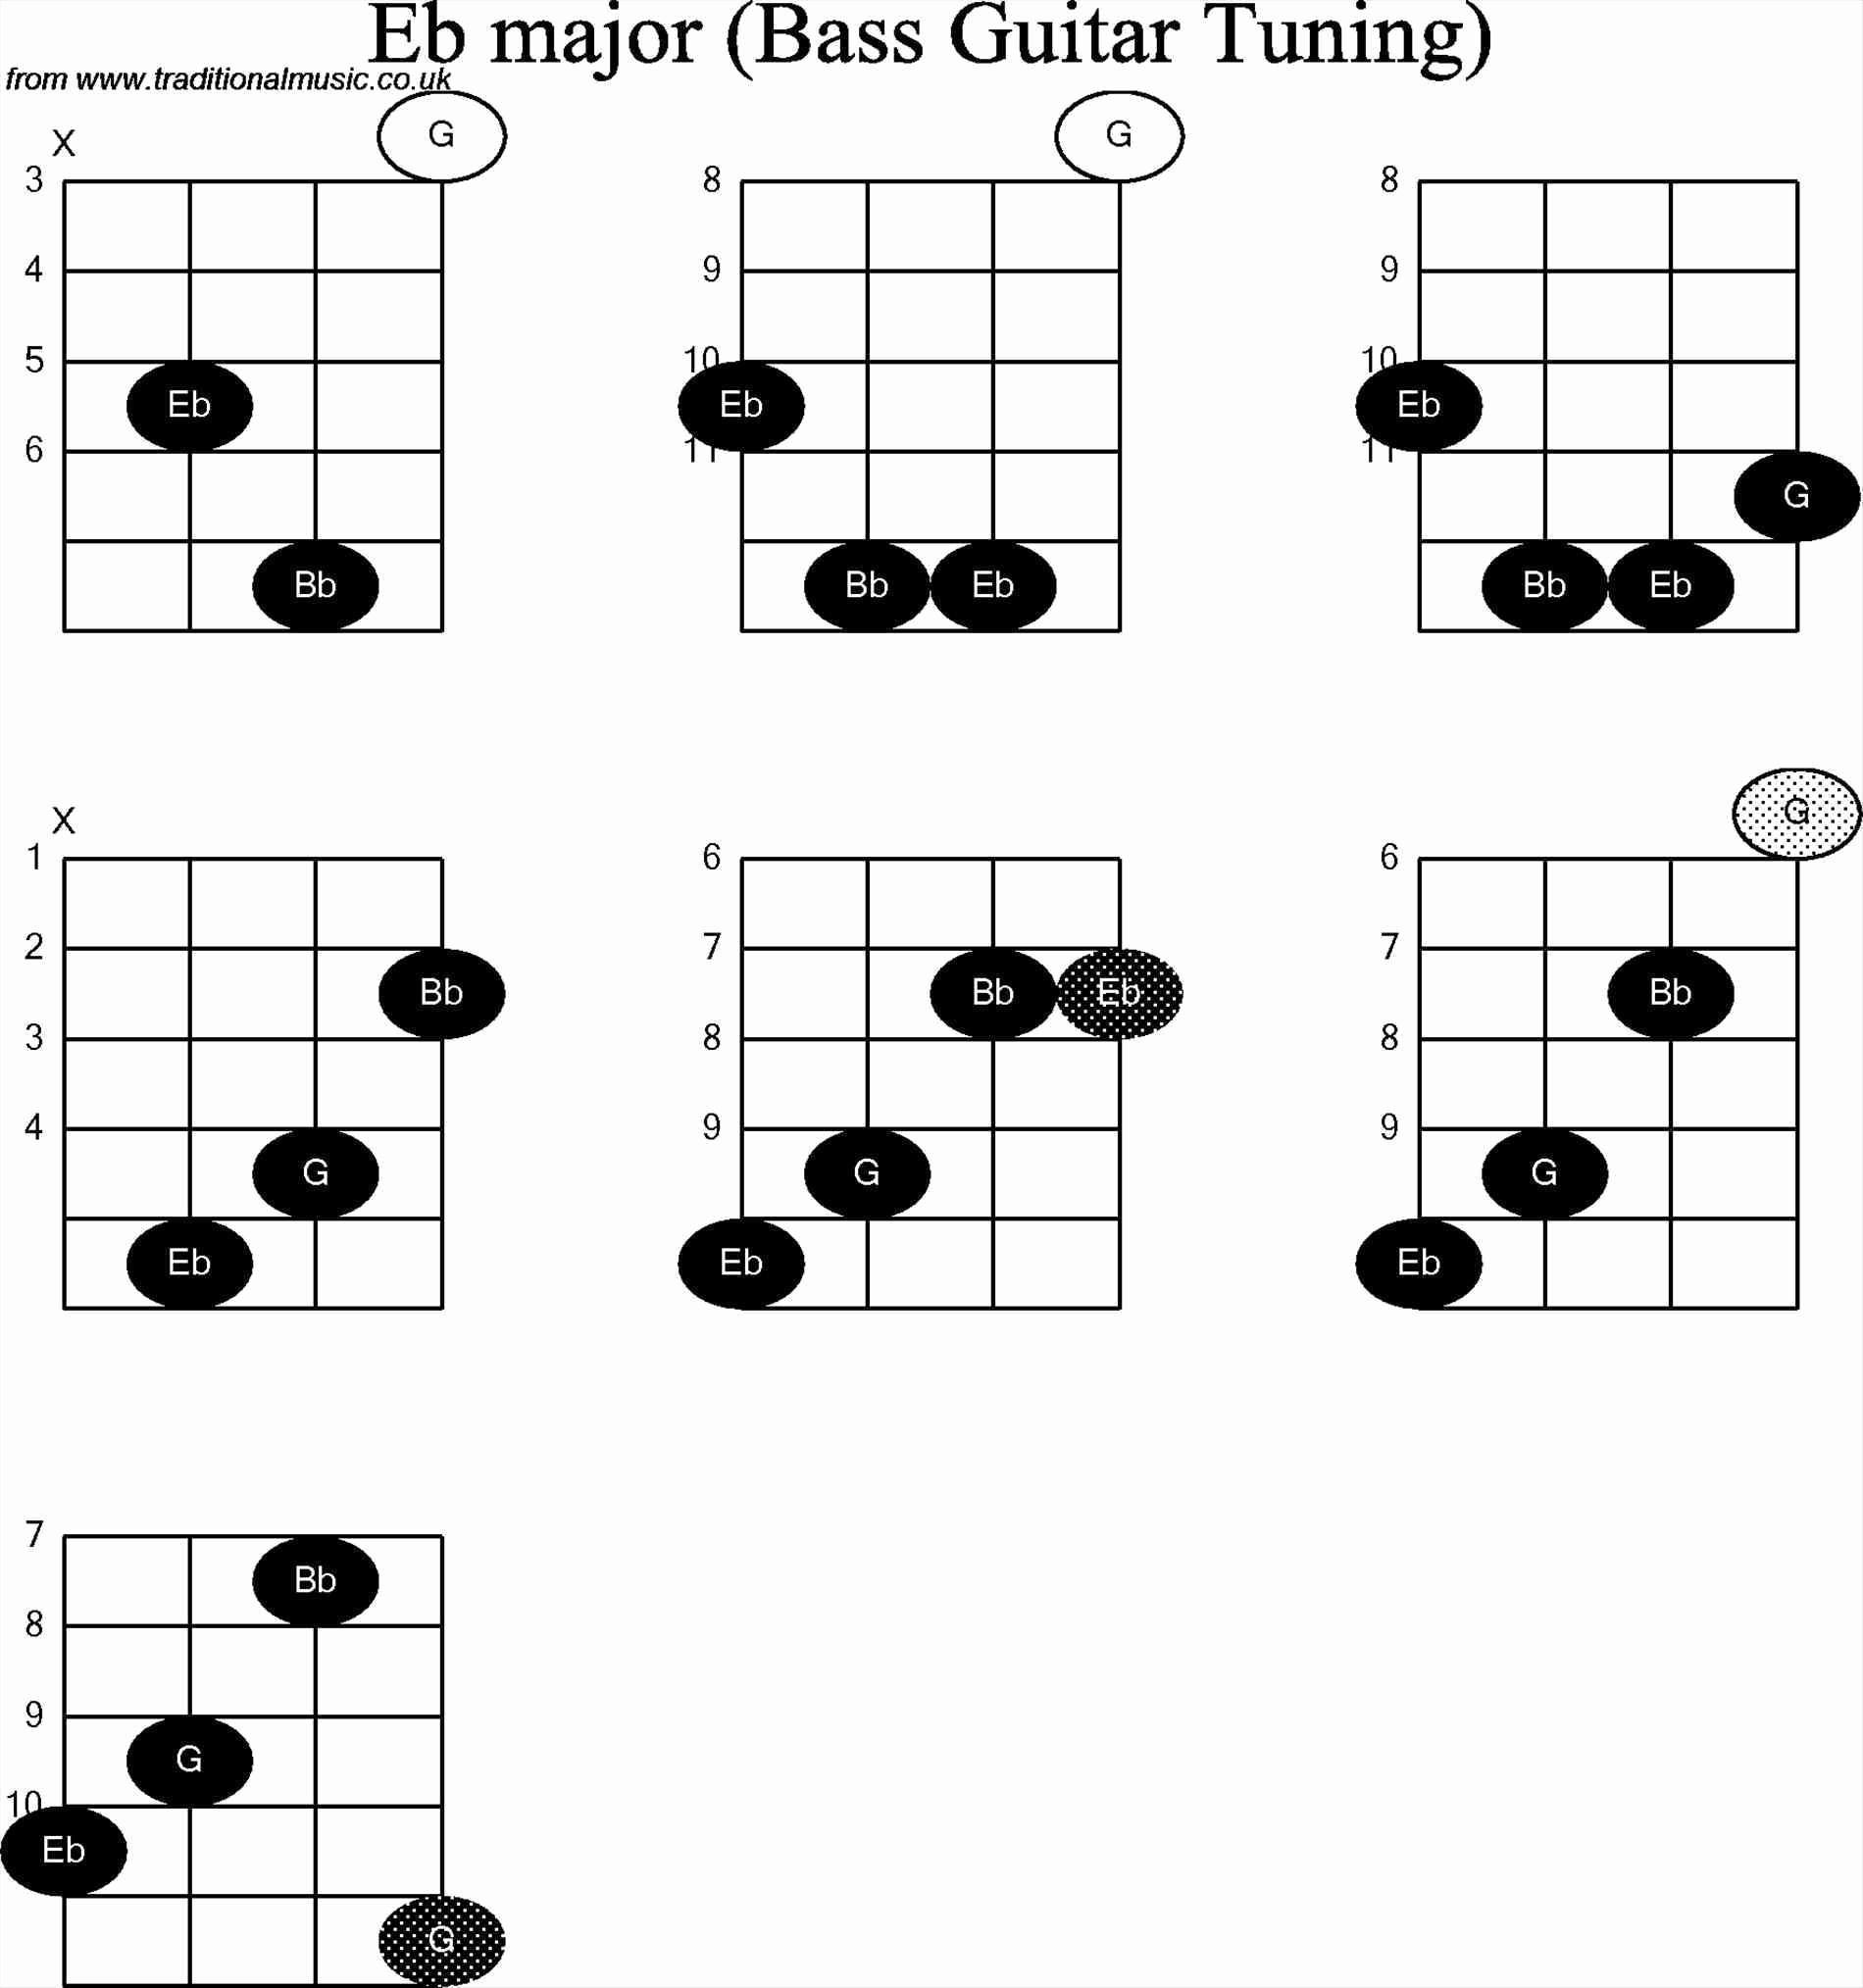 Bass Chords Chart   Accomplice Music - Free Printable Bass Guitar Chord Chart